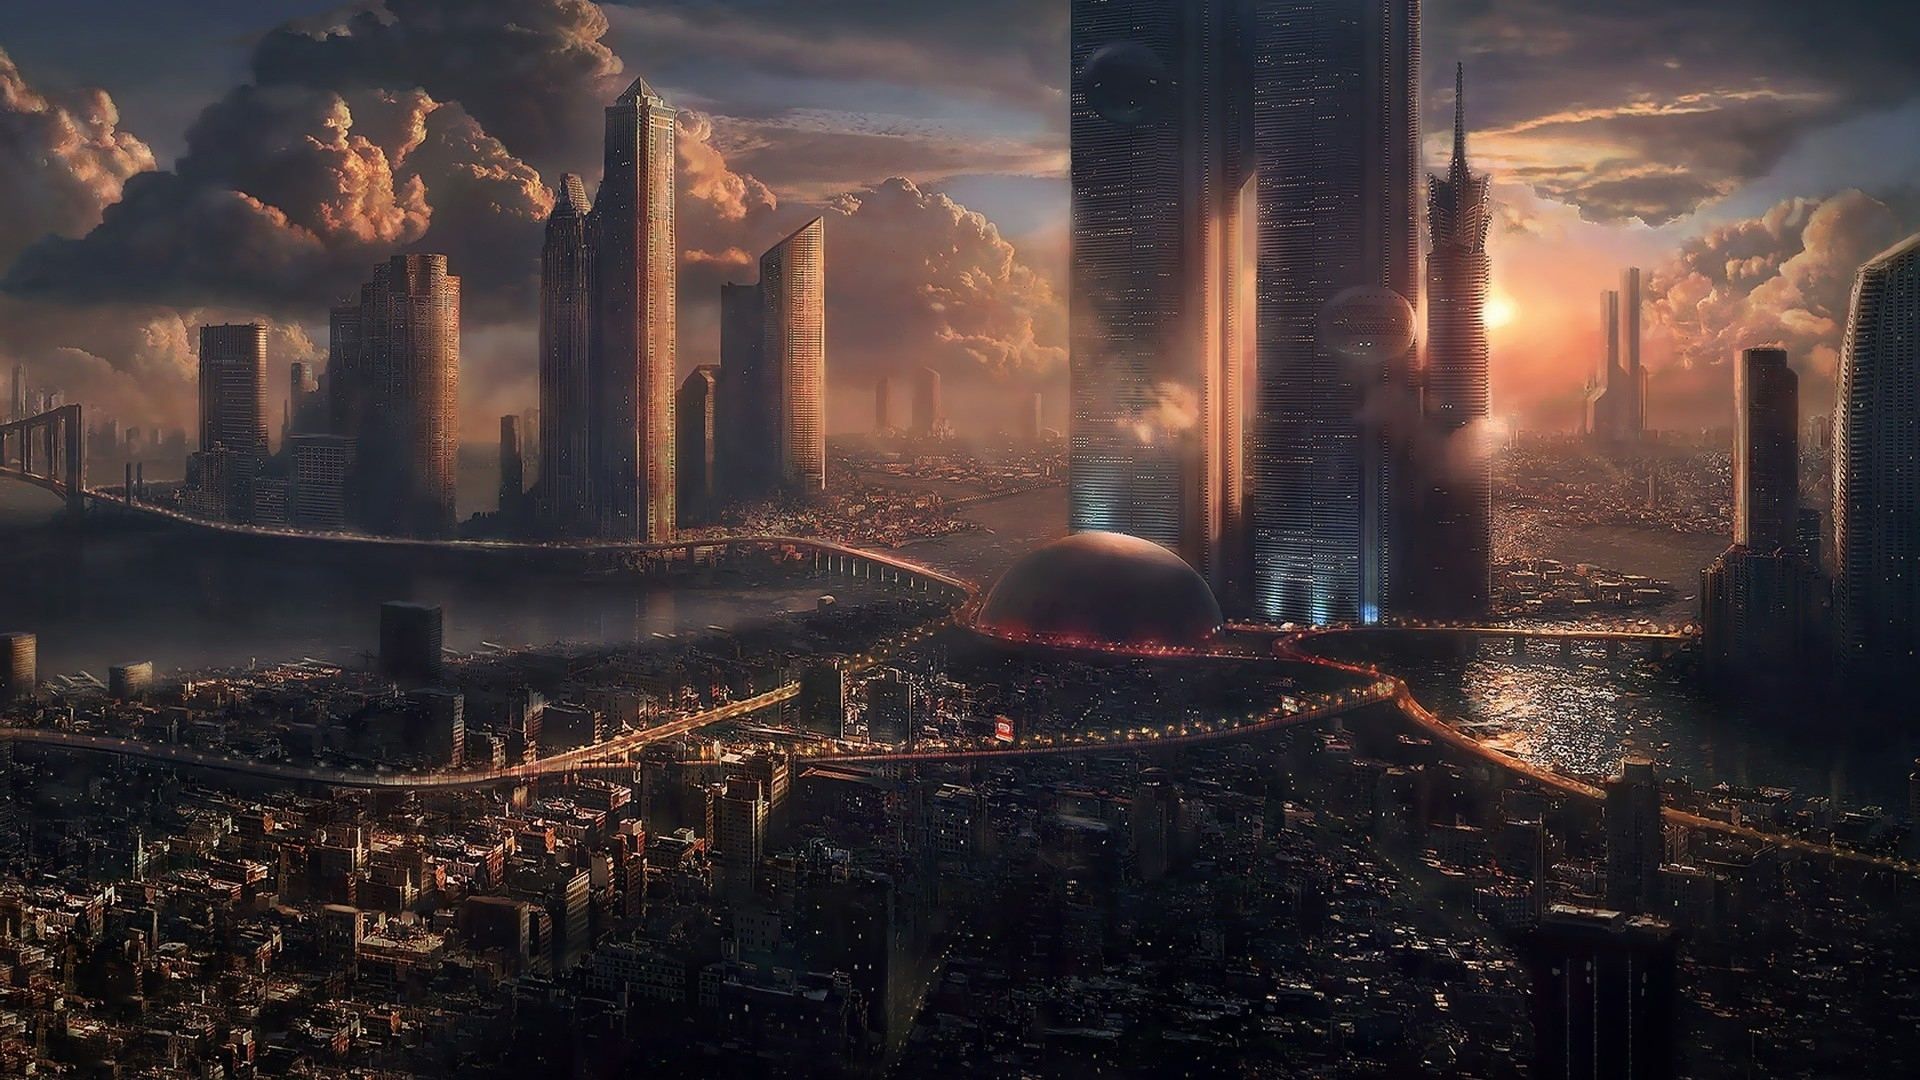 futuristic city wallpaper 1920x1080 (75+ images)